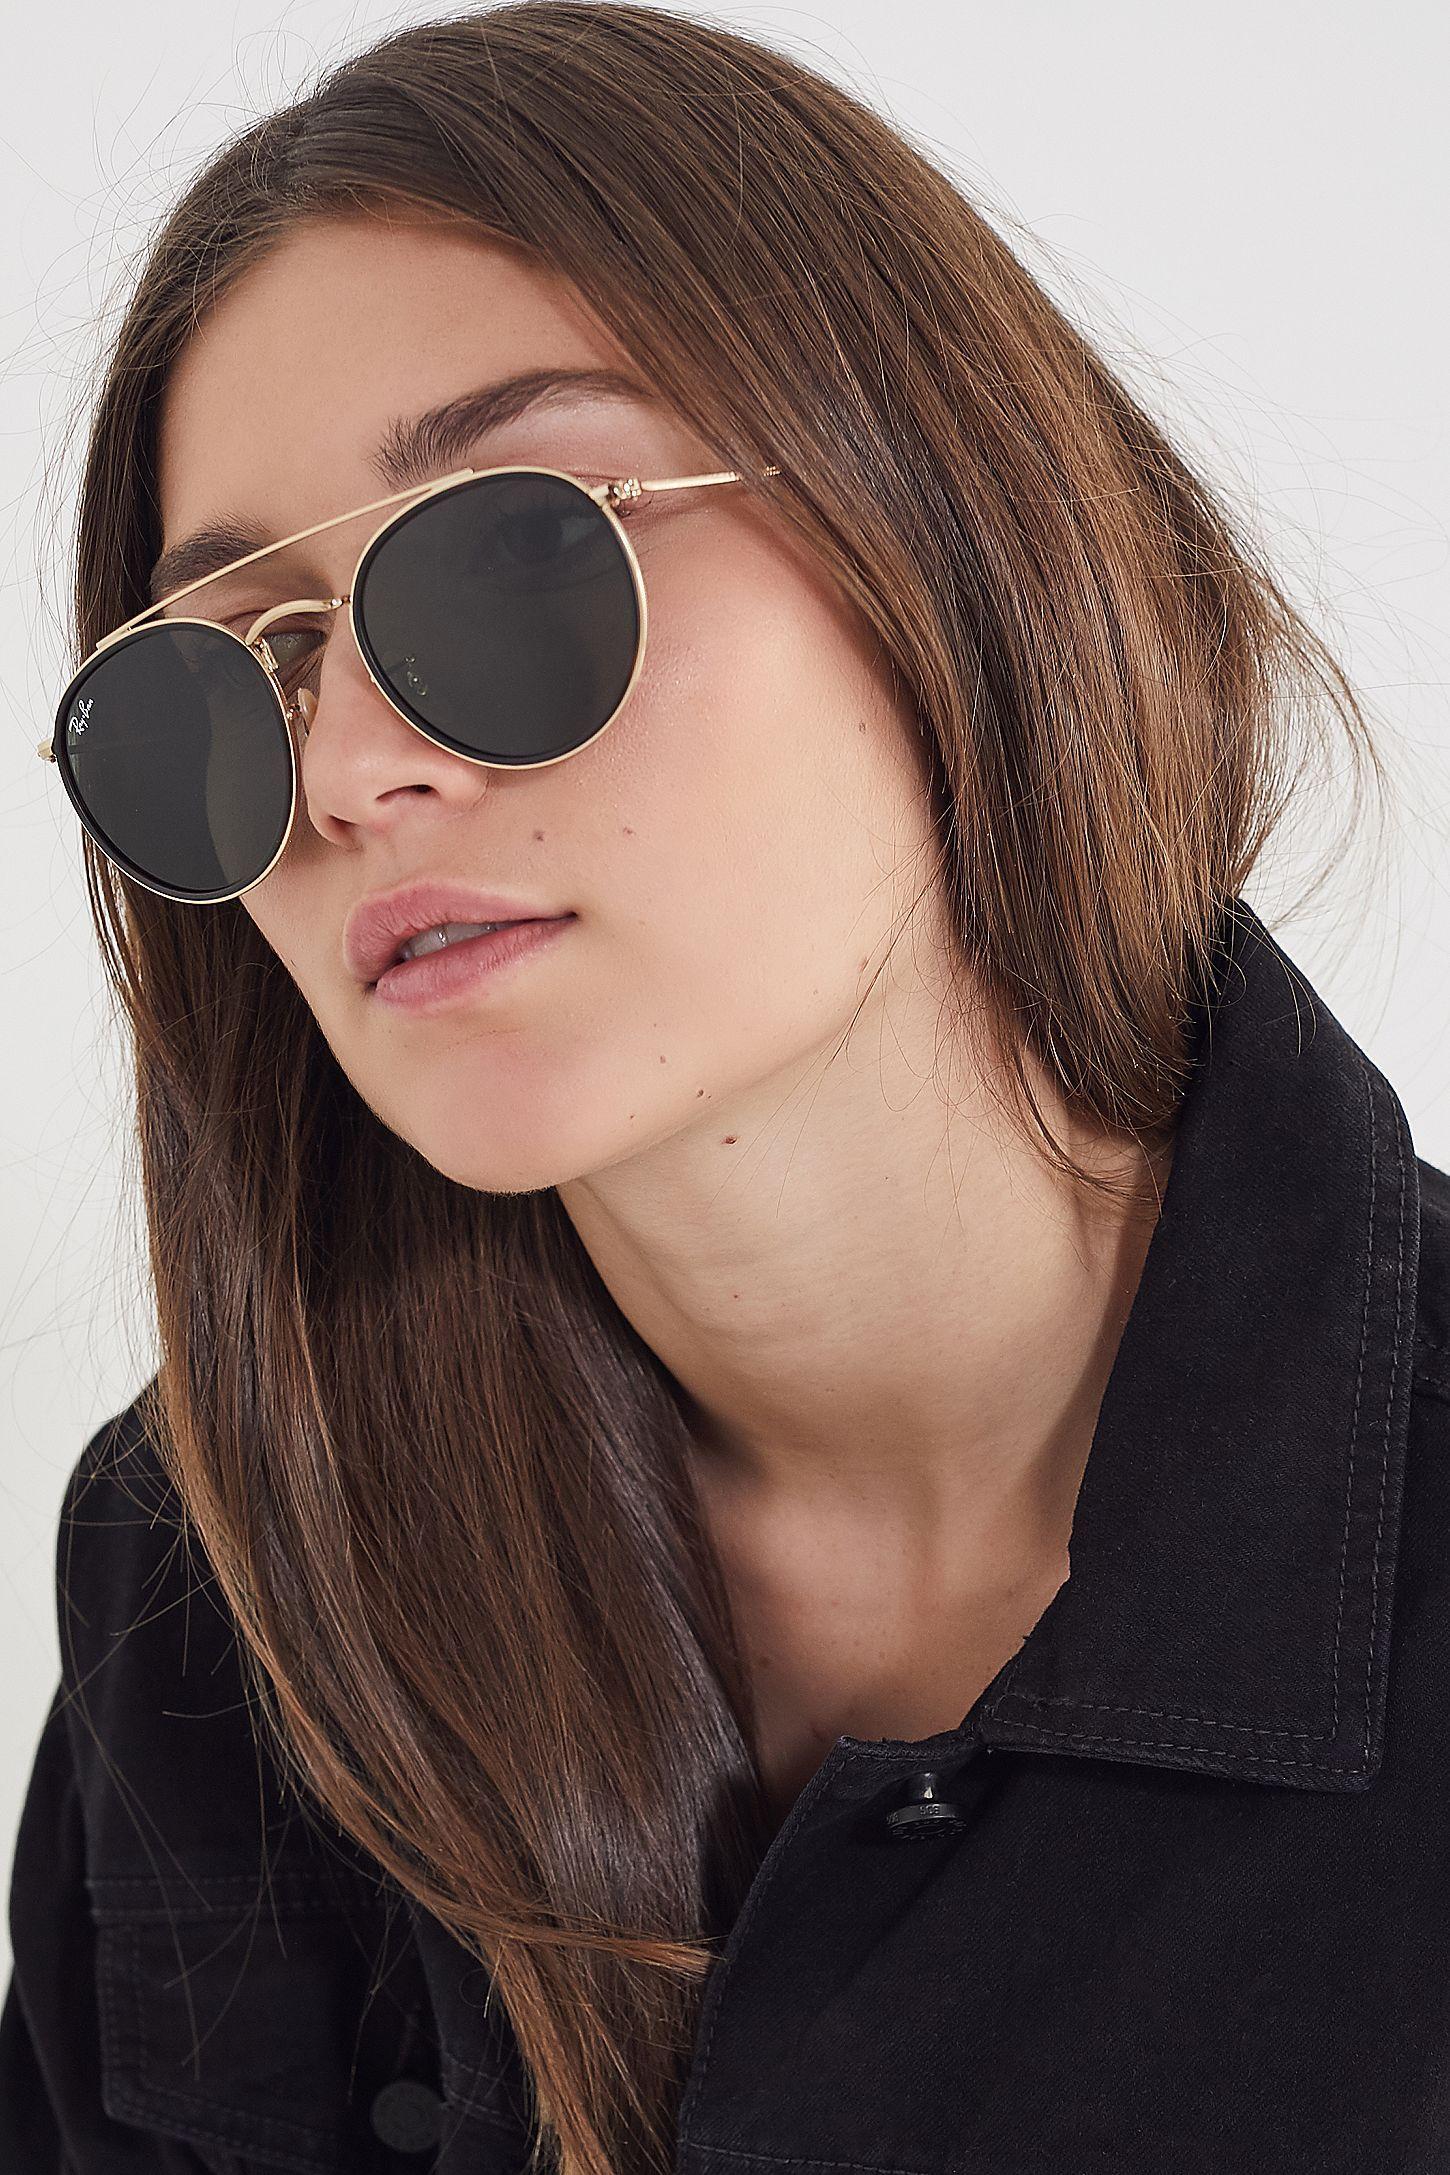 c6c84c987 Ray-Ban Round Double Bridge Sunglasses | Hair ideas | Round ray bans ...